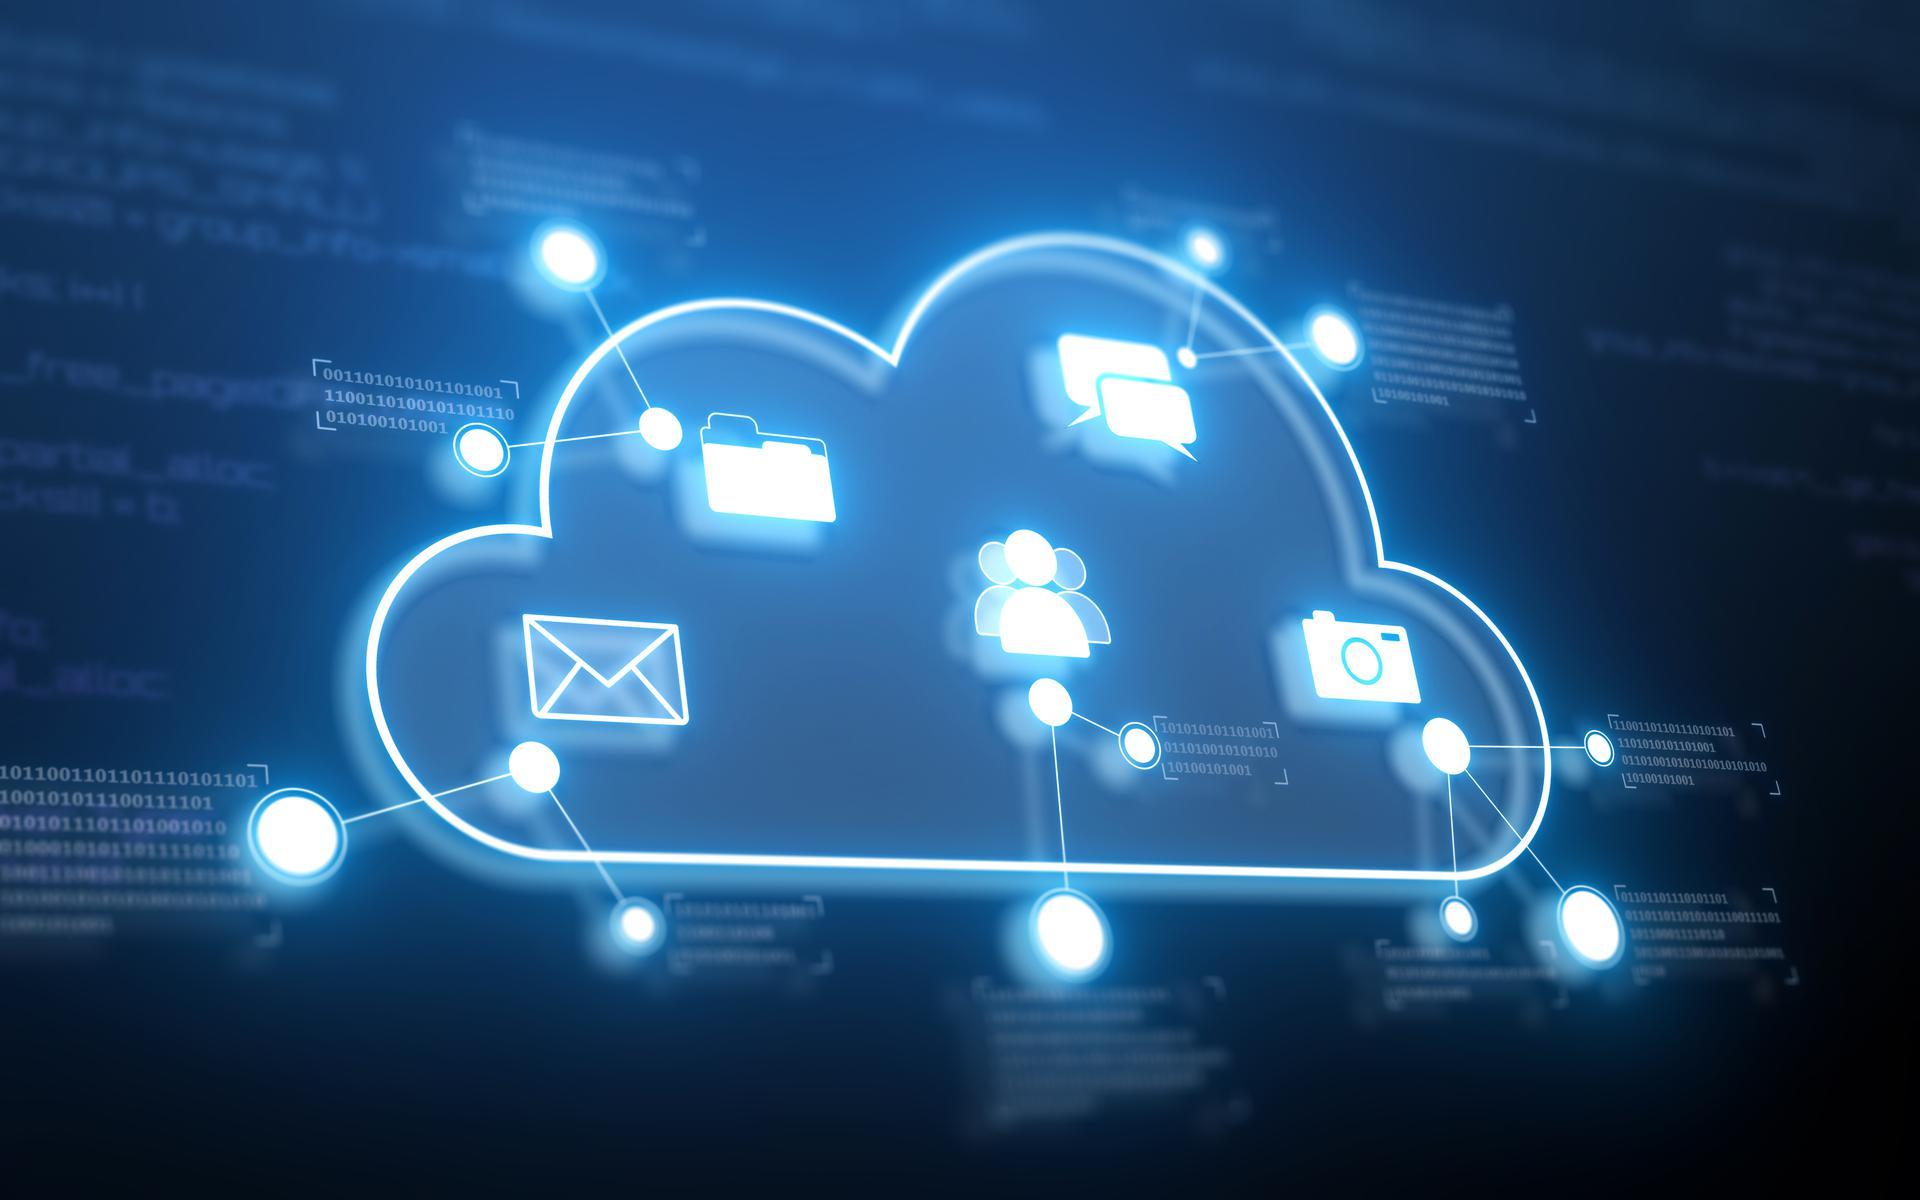 cloud_computing_concept_photo_cpc